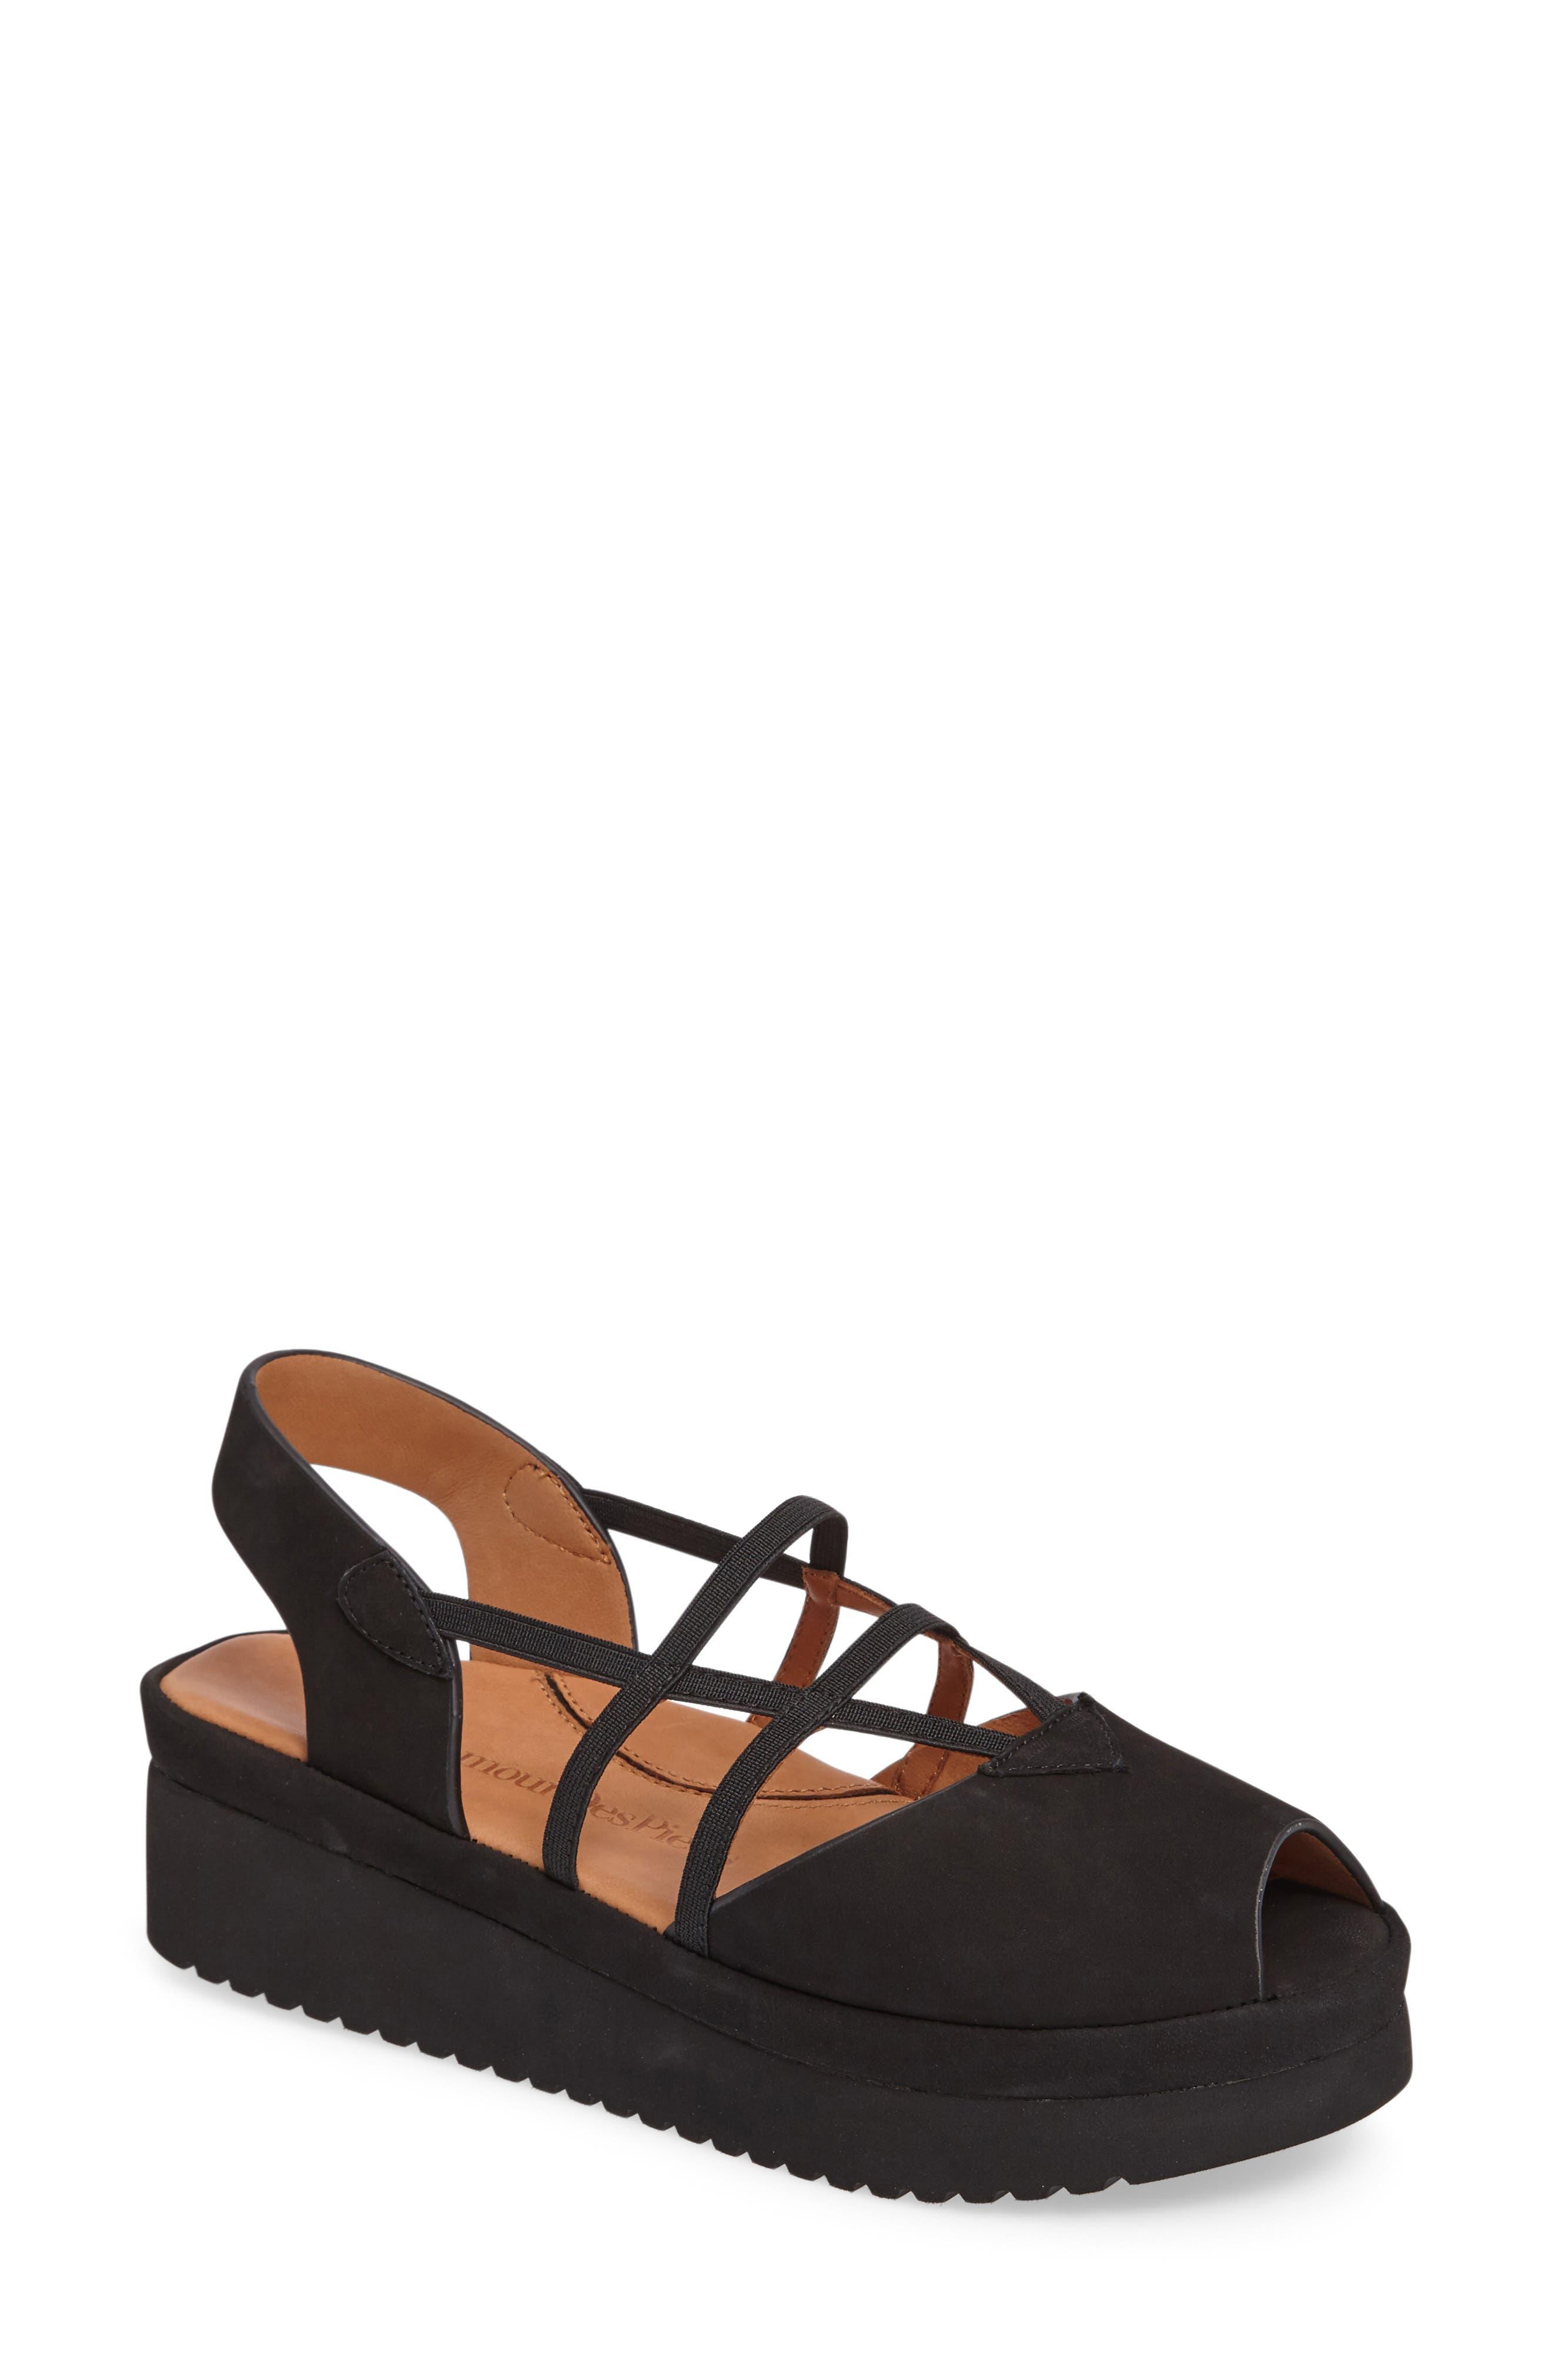 Adelais Platform Wedge Sandal, Main, color, BLACK NUBUCK LEATHER